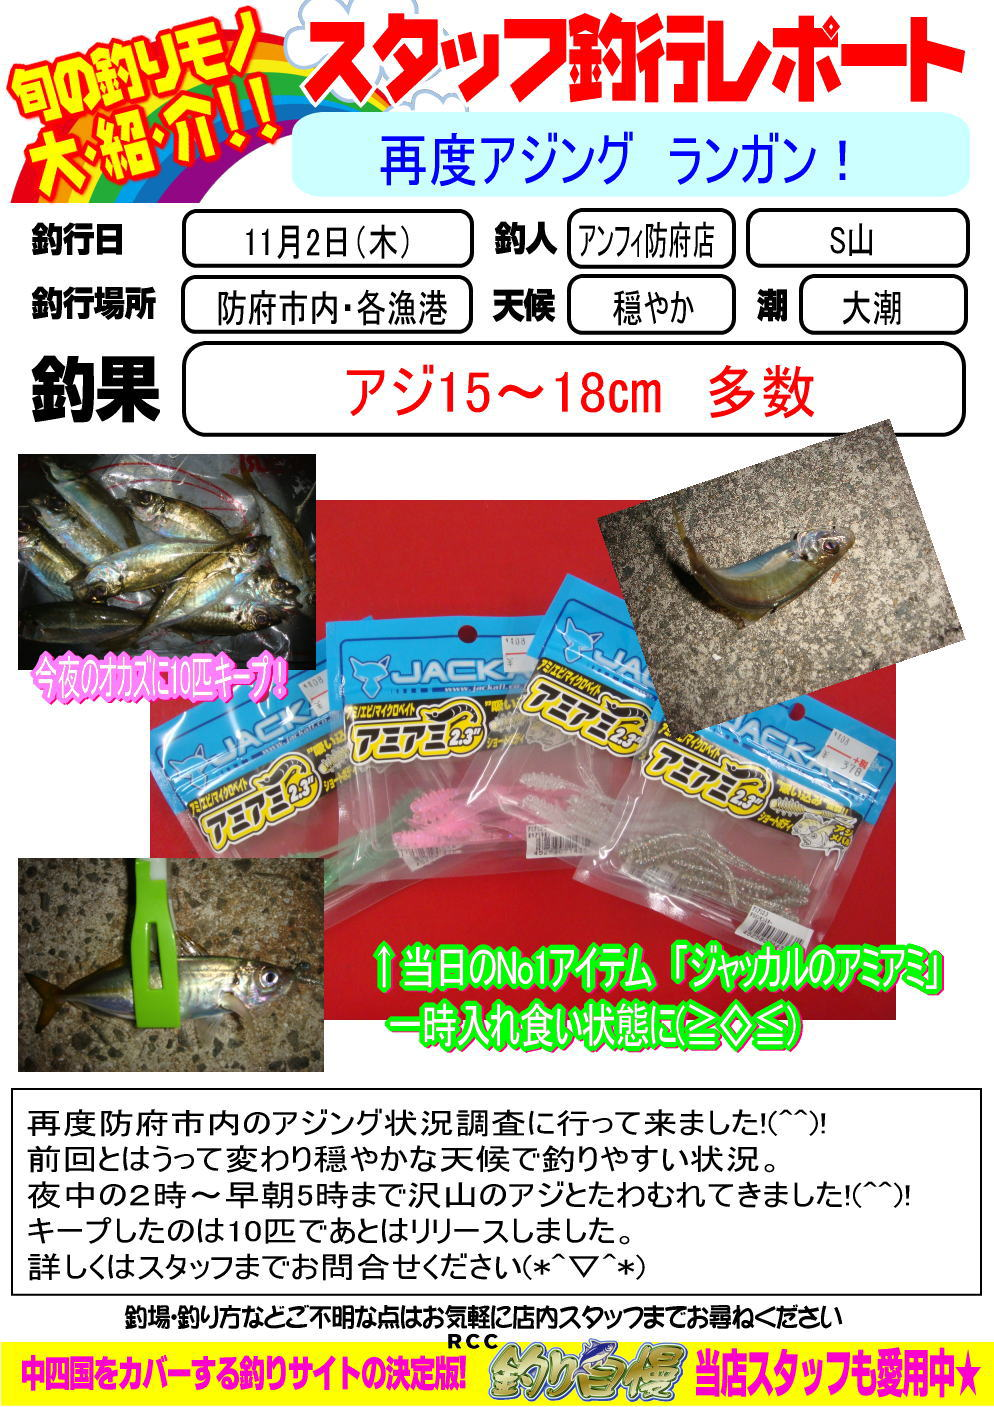 http://www.e-angle.co.jp/shop/blog/blog-20171102-houfu-aji.jpg